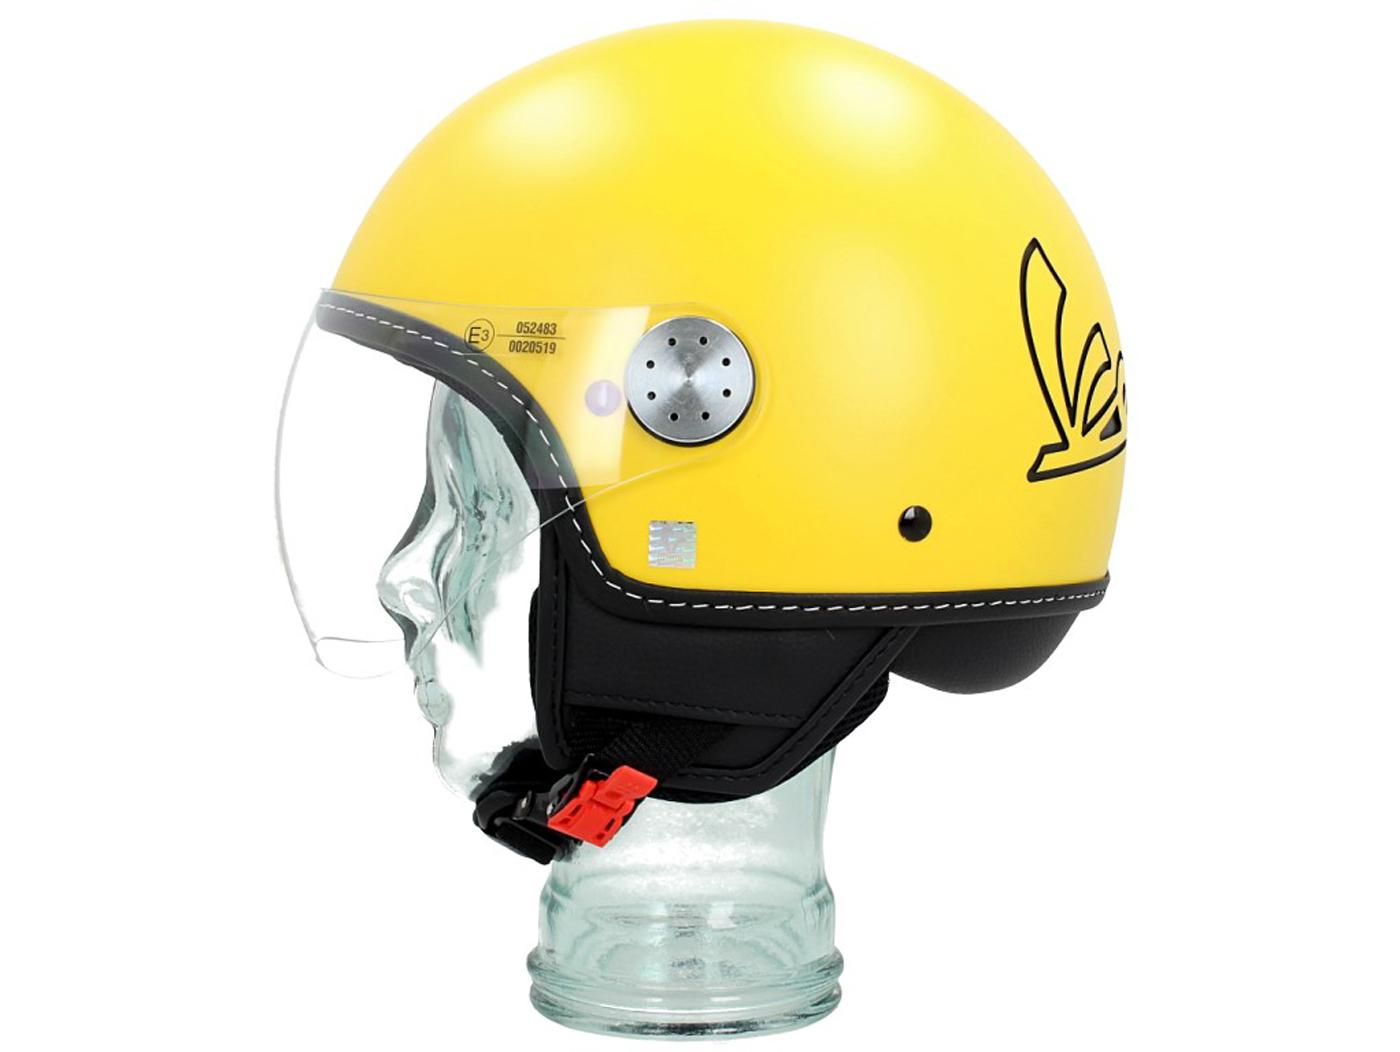 Helmet Vespa Visor 3 0 Yellow Gelosia 974a L 59 60cm Scooter Center